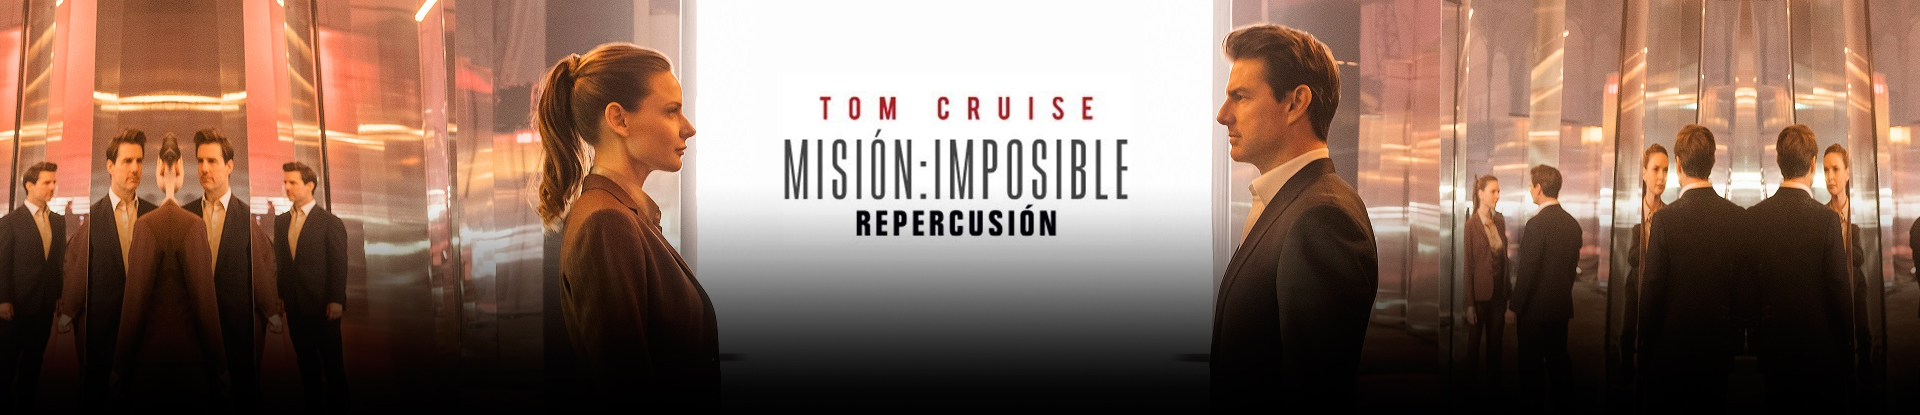 Misión: imposible repercusión